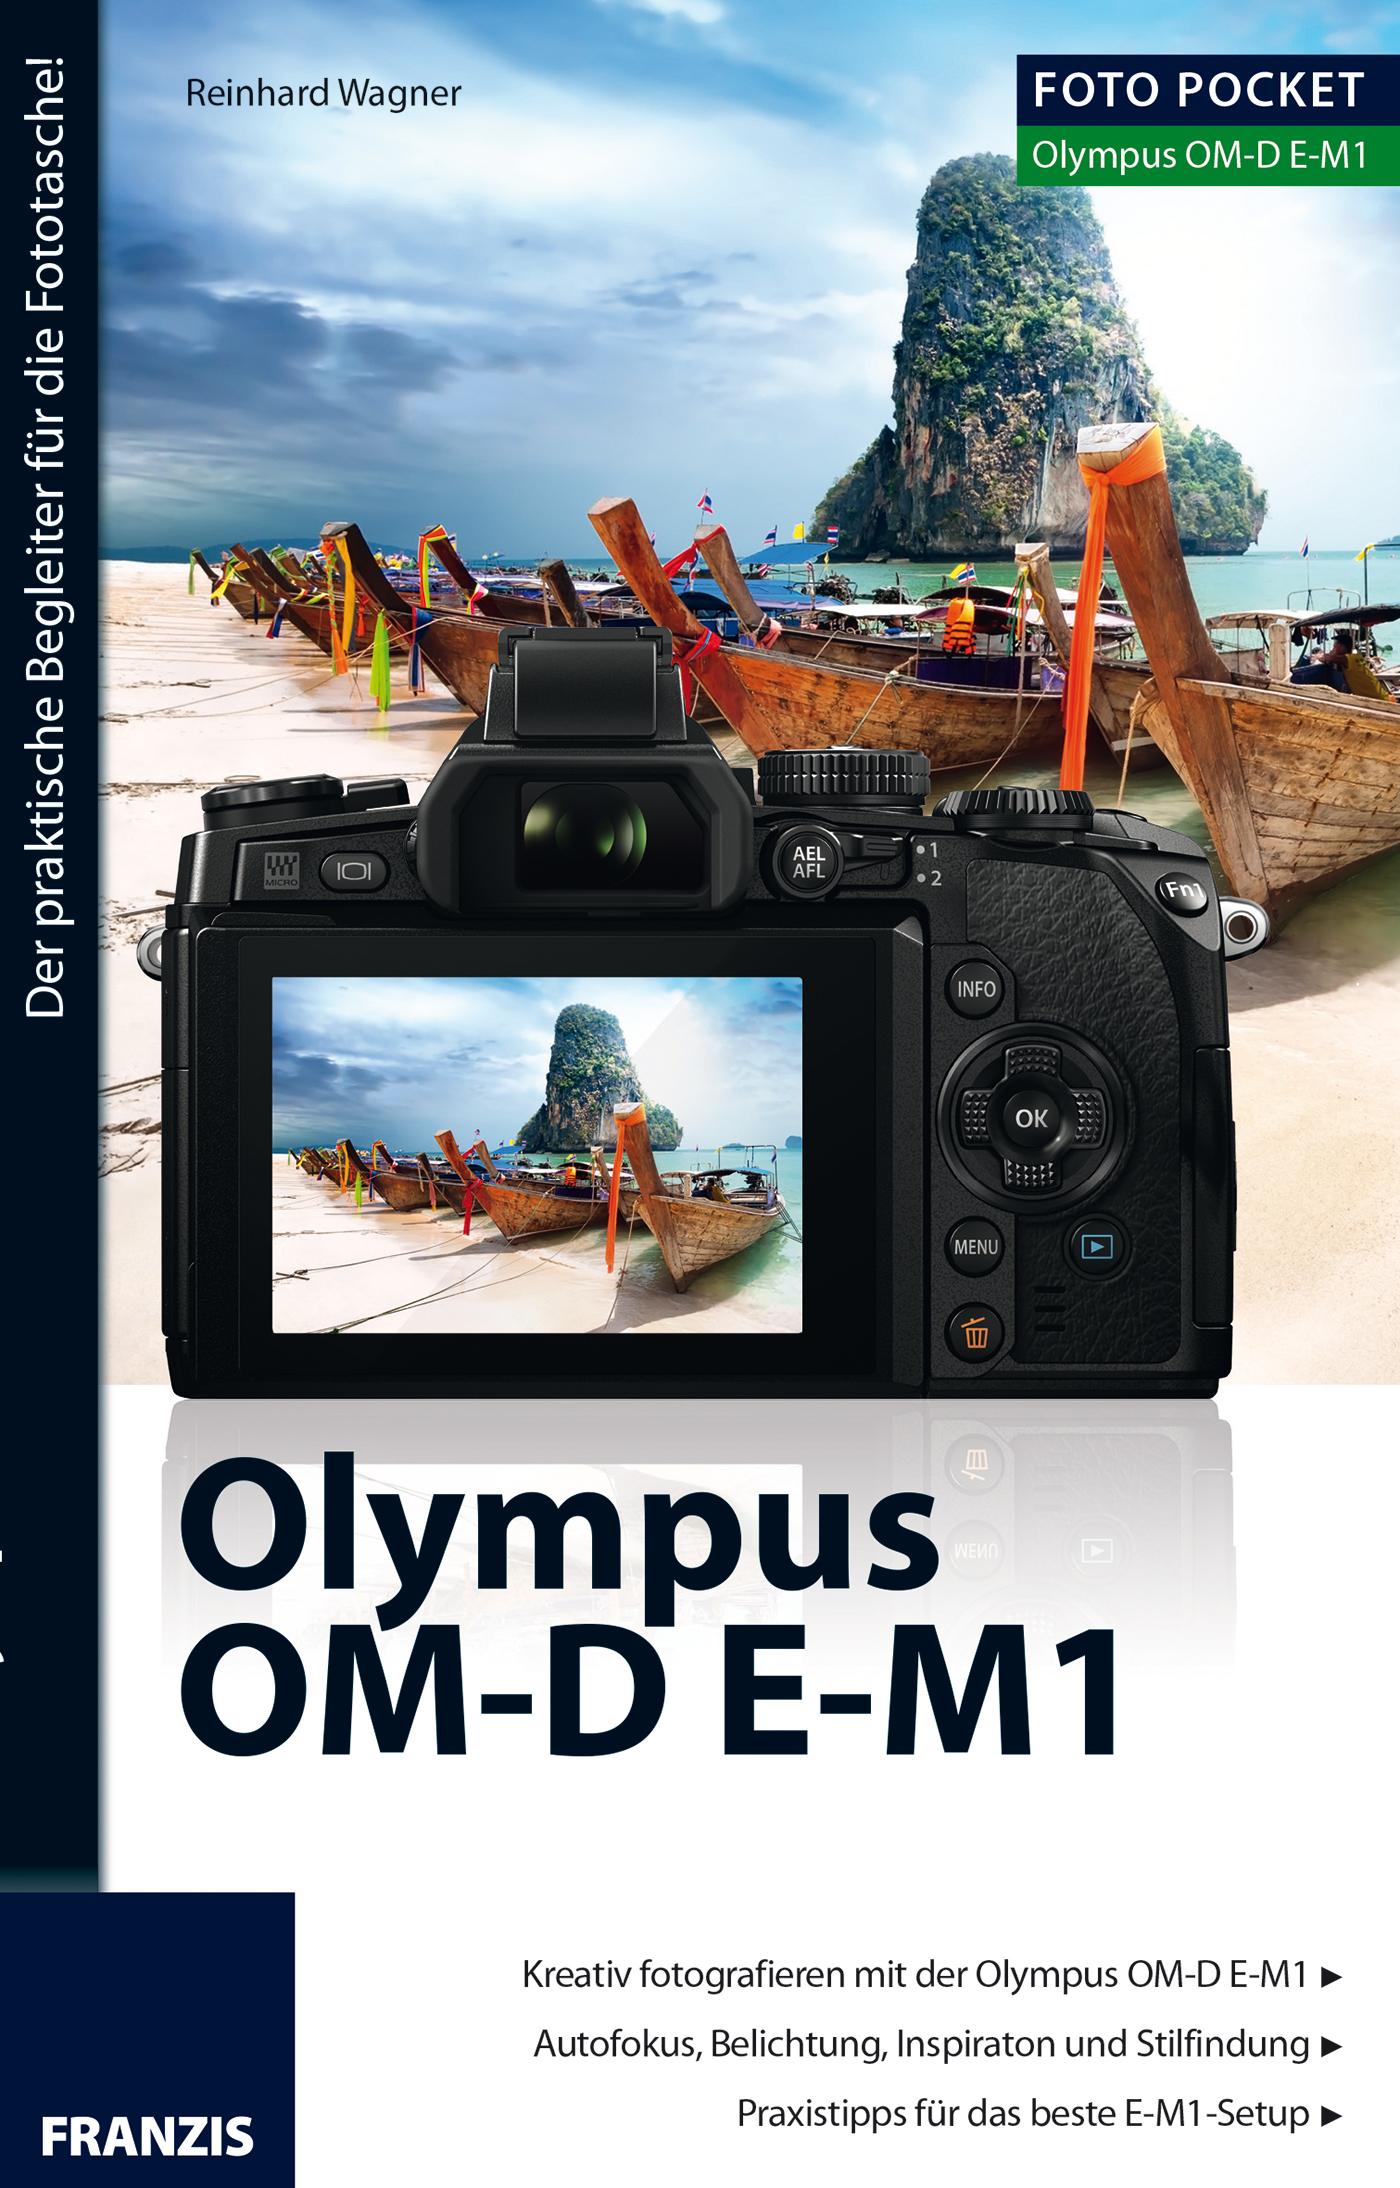 Wagner, Reinhard / Foto Pocket Olympus OM-D E-M1